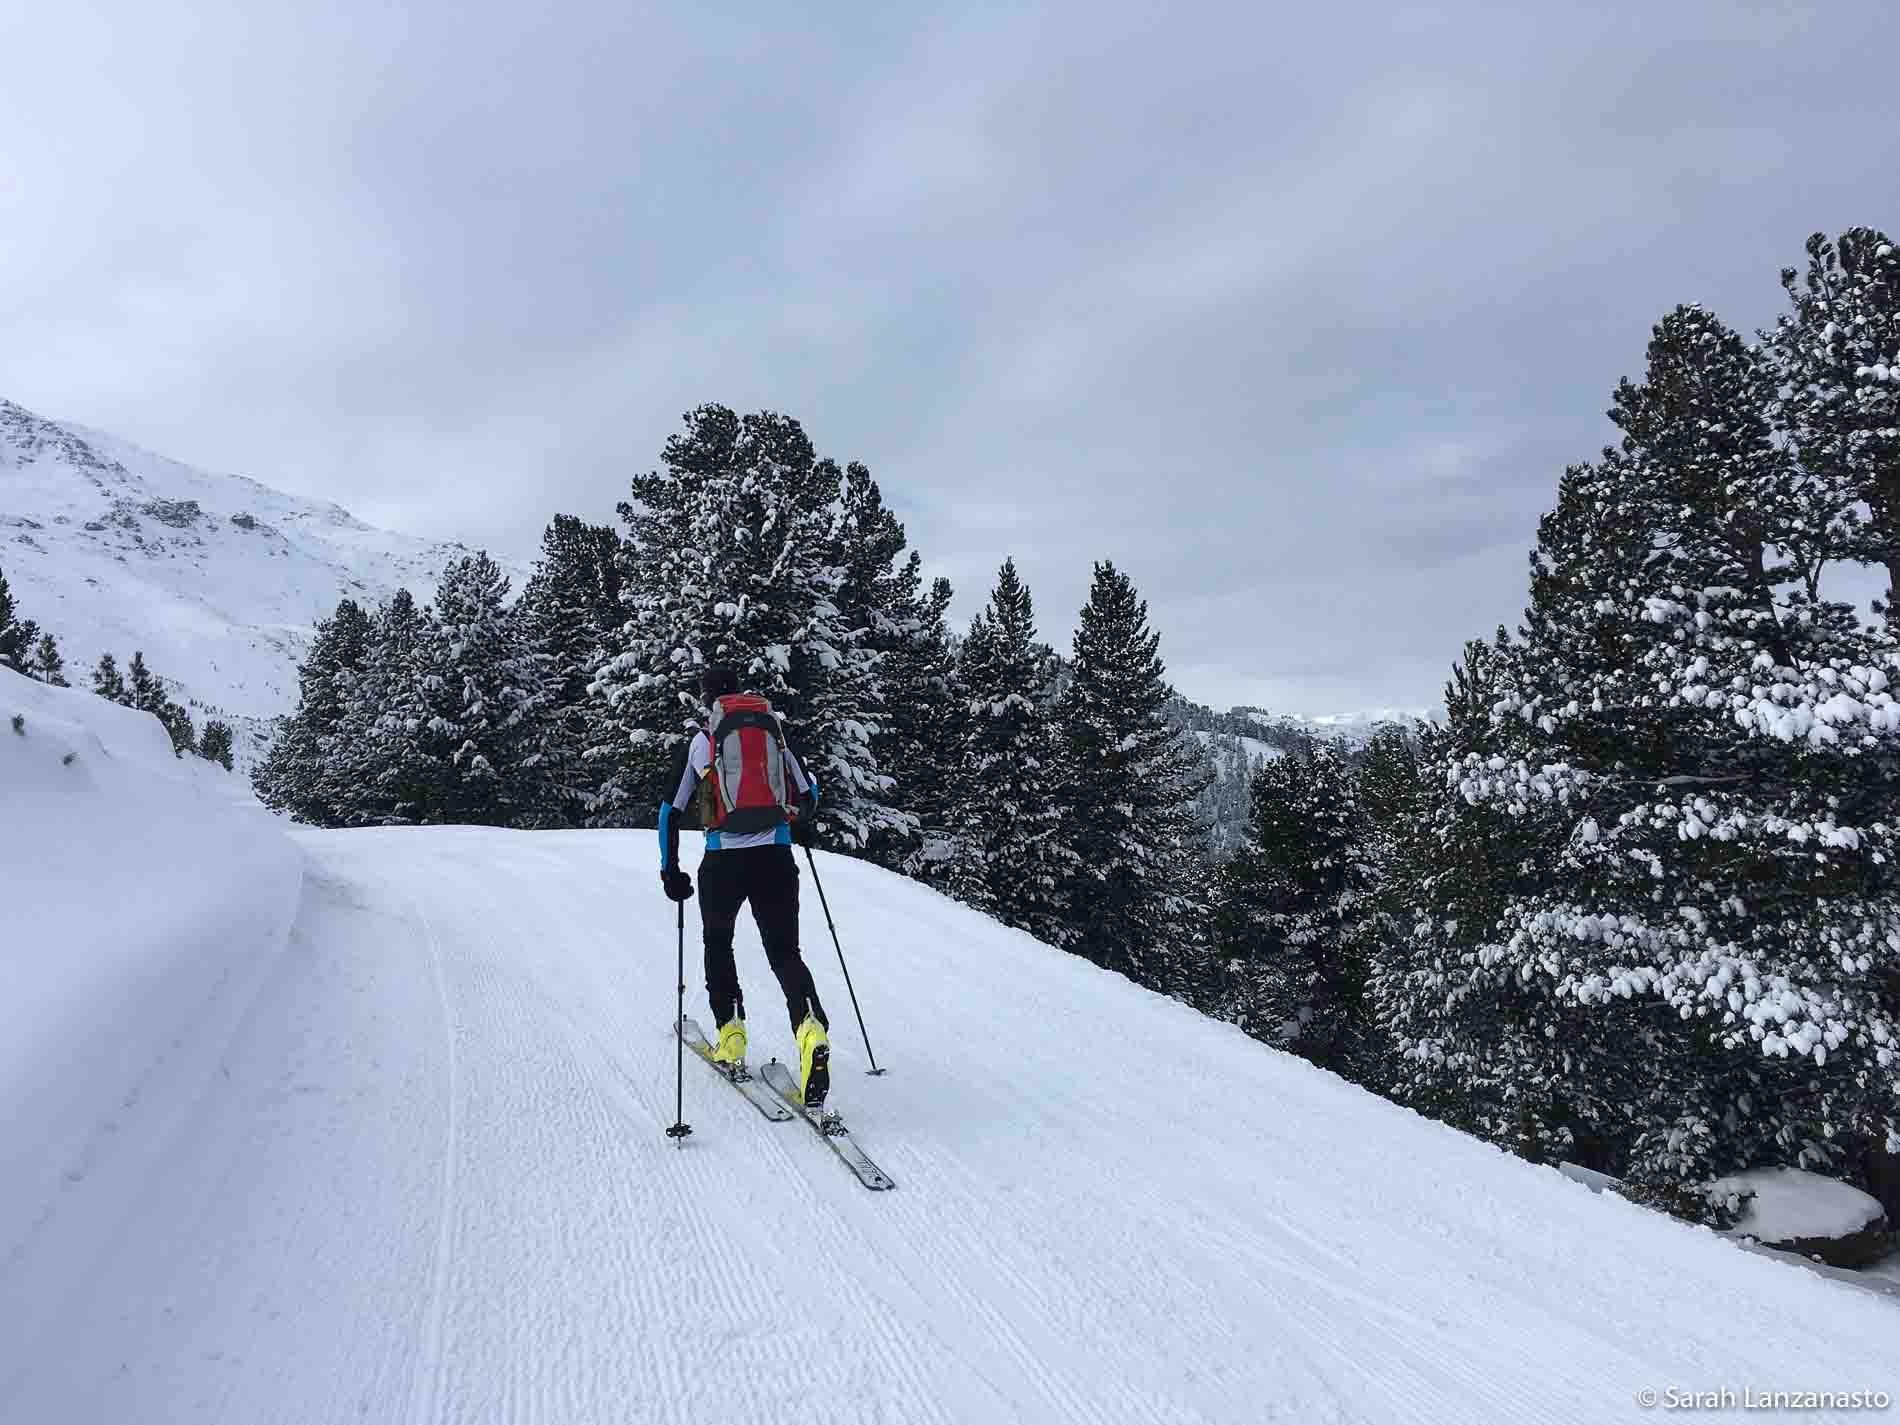 Sarah Lanzanasto - Alpenverein skialp na zjazdovkach